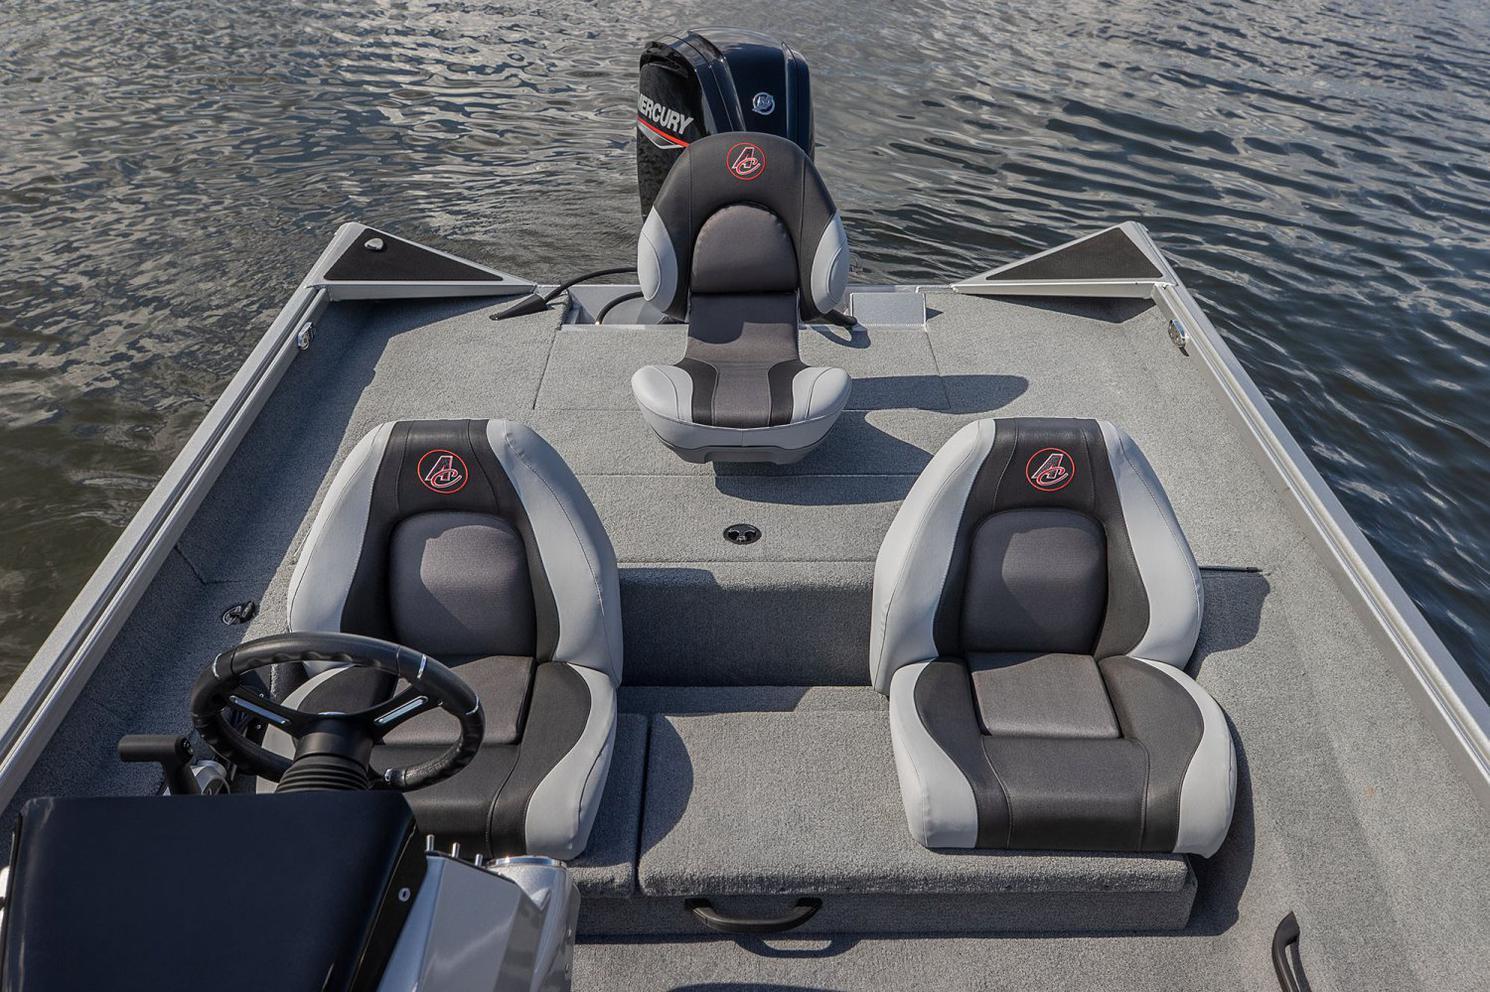 2021 Alumacraft boat for sale, model of the boat is Alumacraft Pro Series 185 & Image # 7 of 8